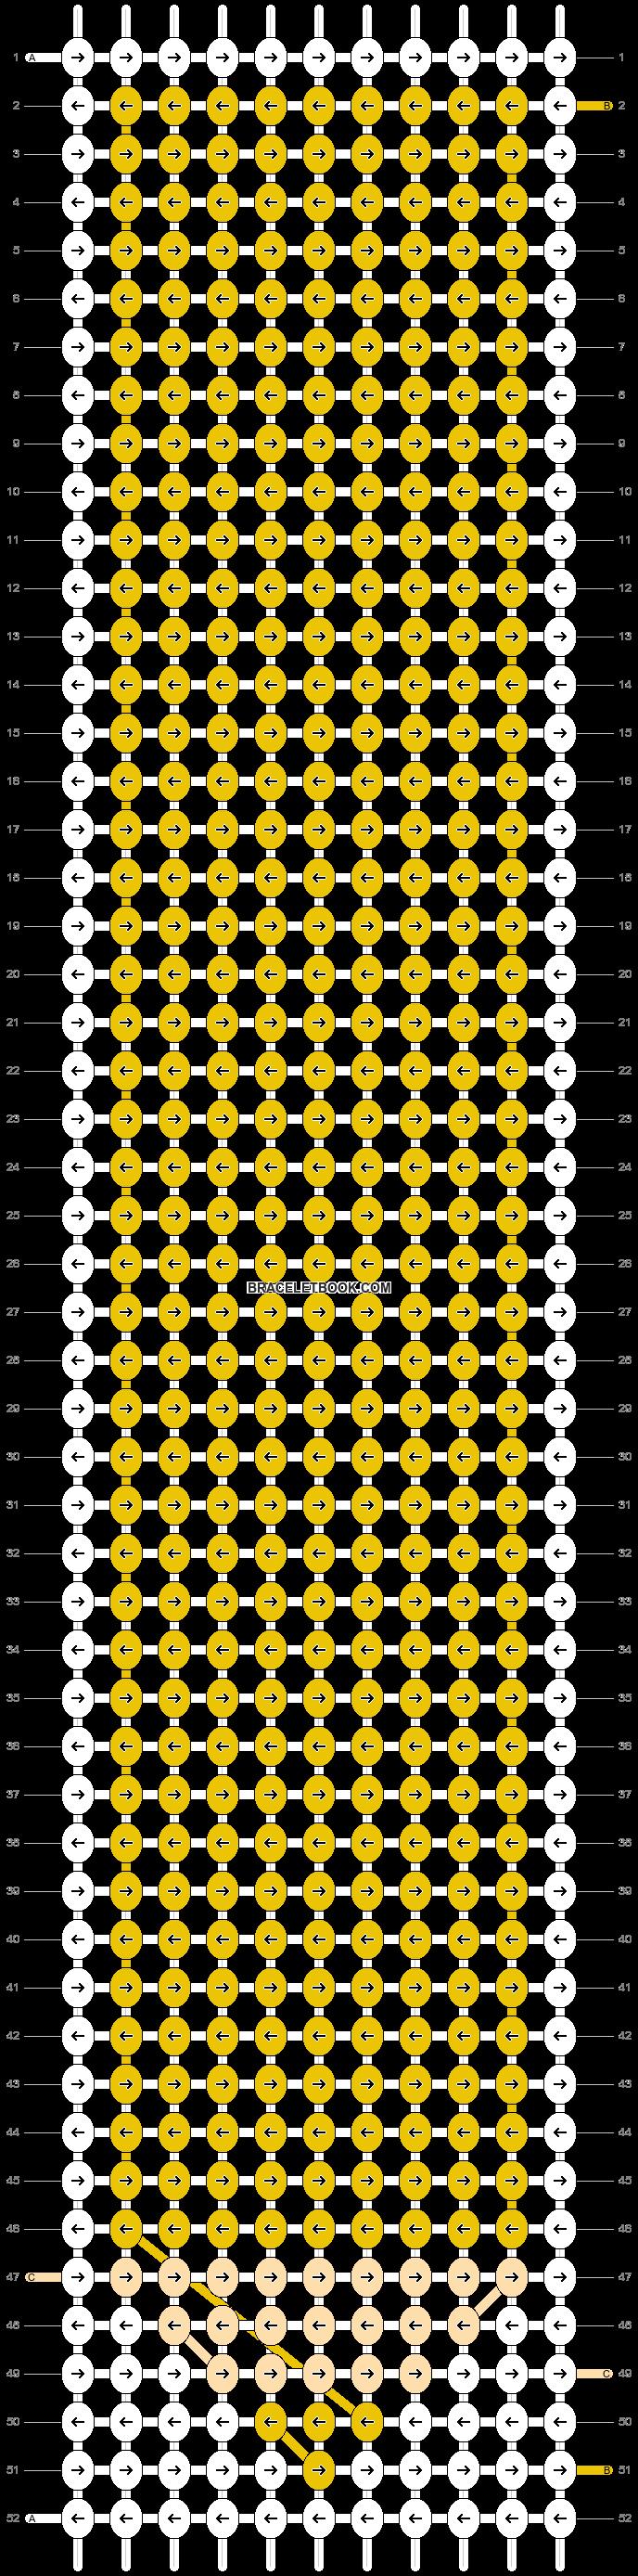 Alpha pattern #15410 variation #127943 pattern